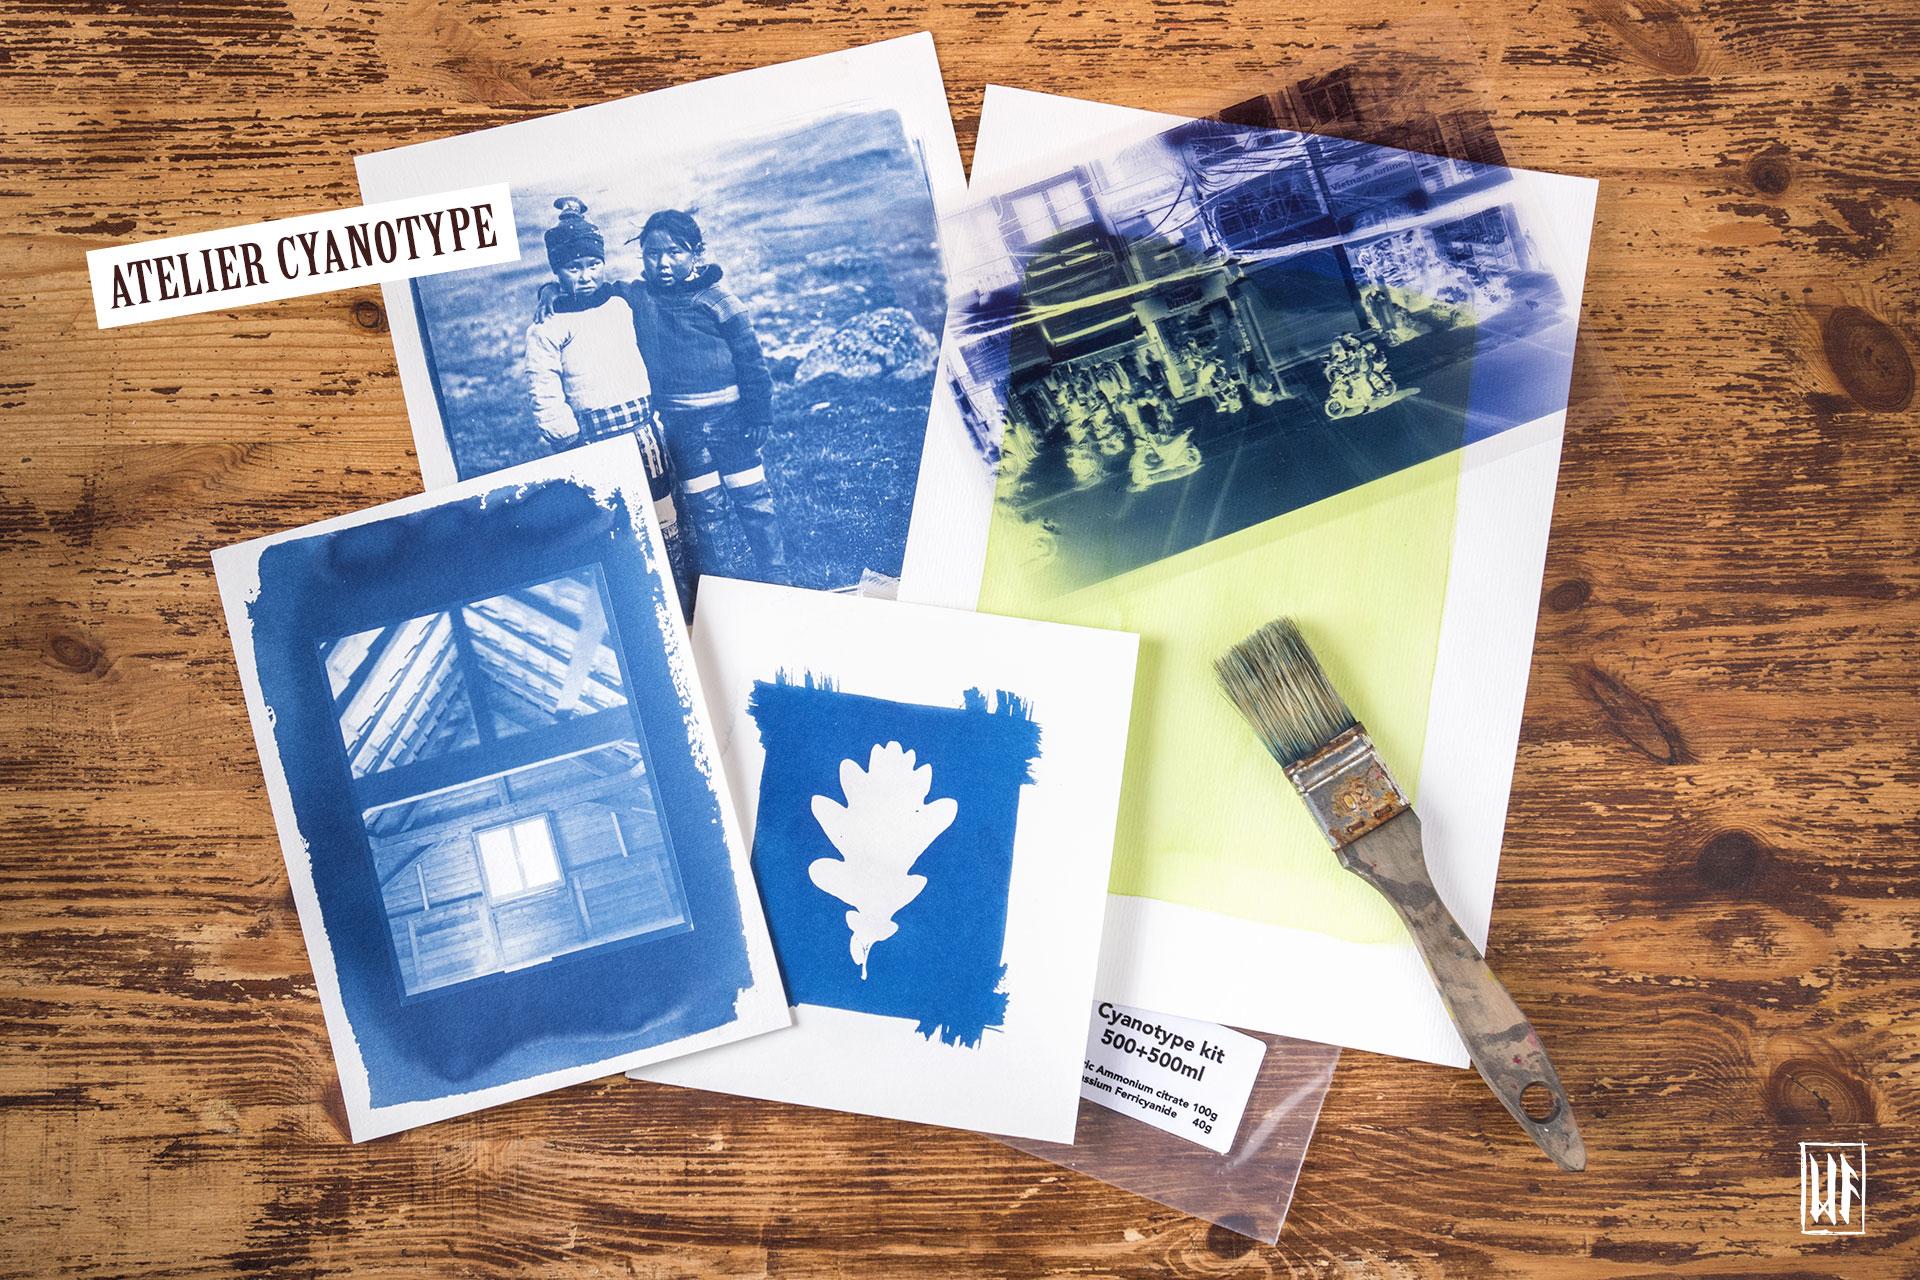 Photographie alternative : tirage au cyanotype ou Van Dyke